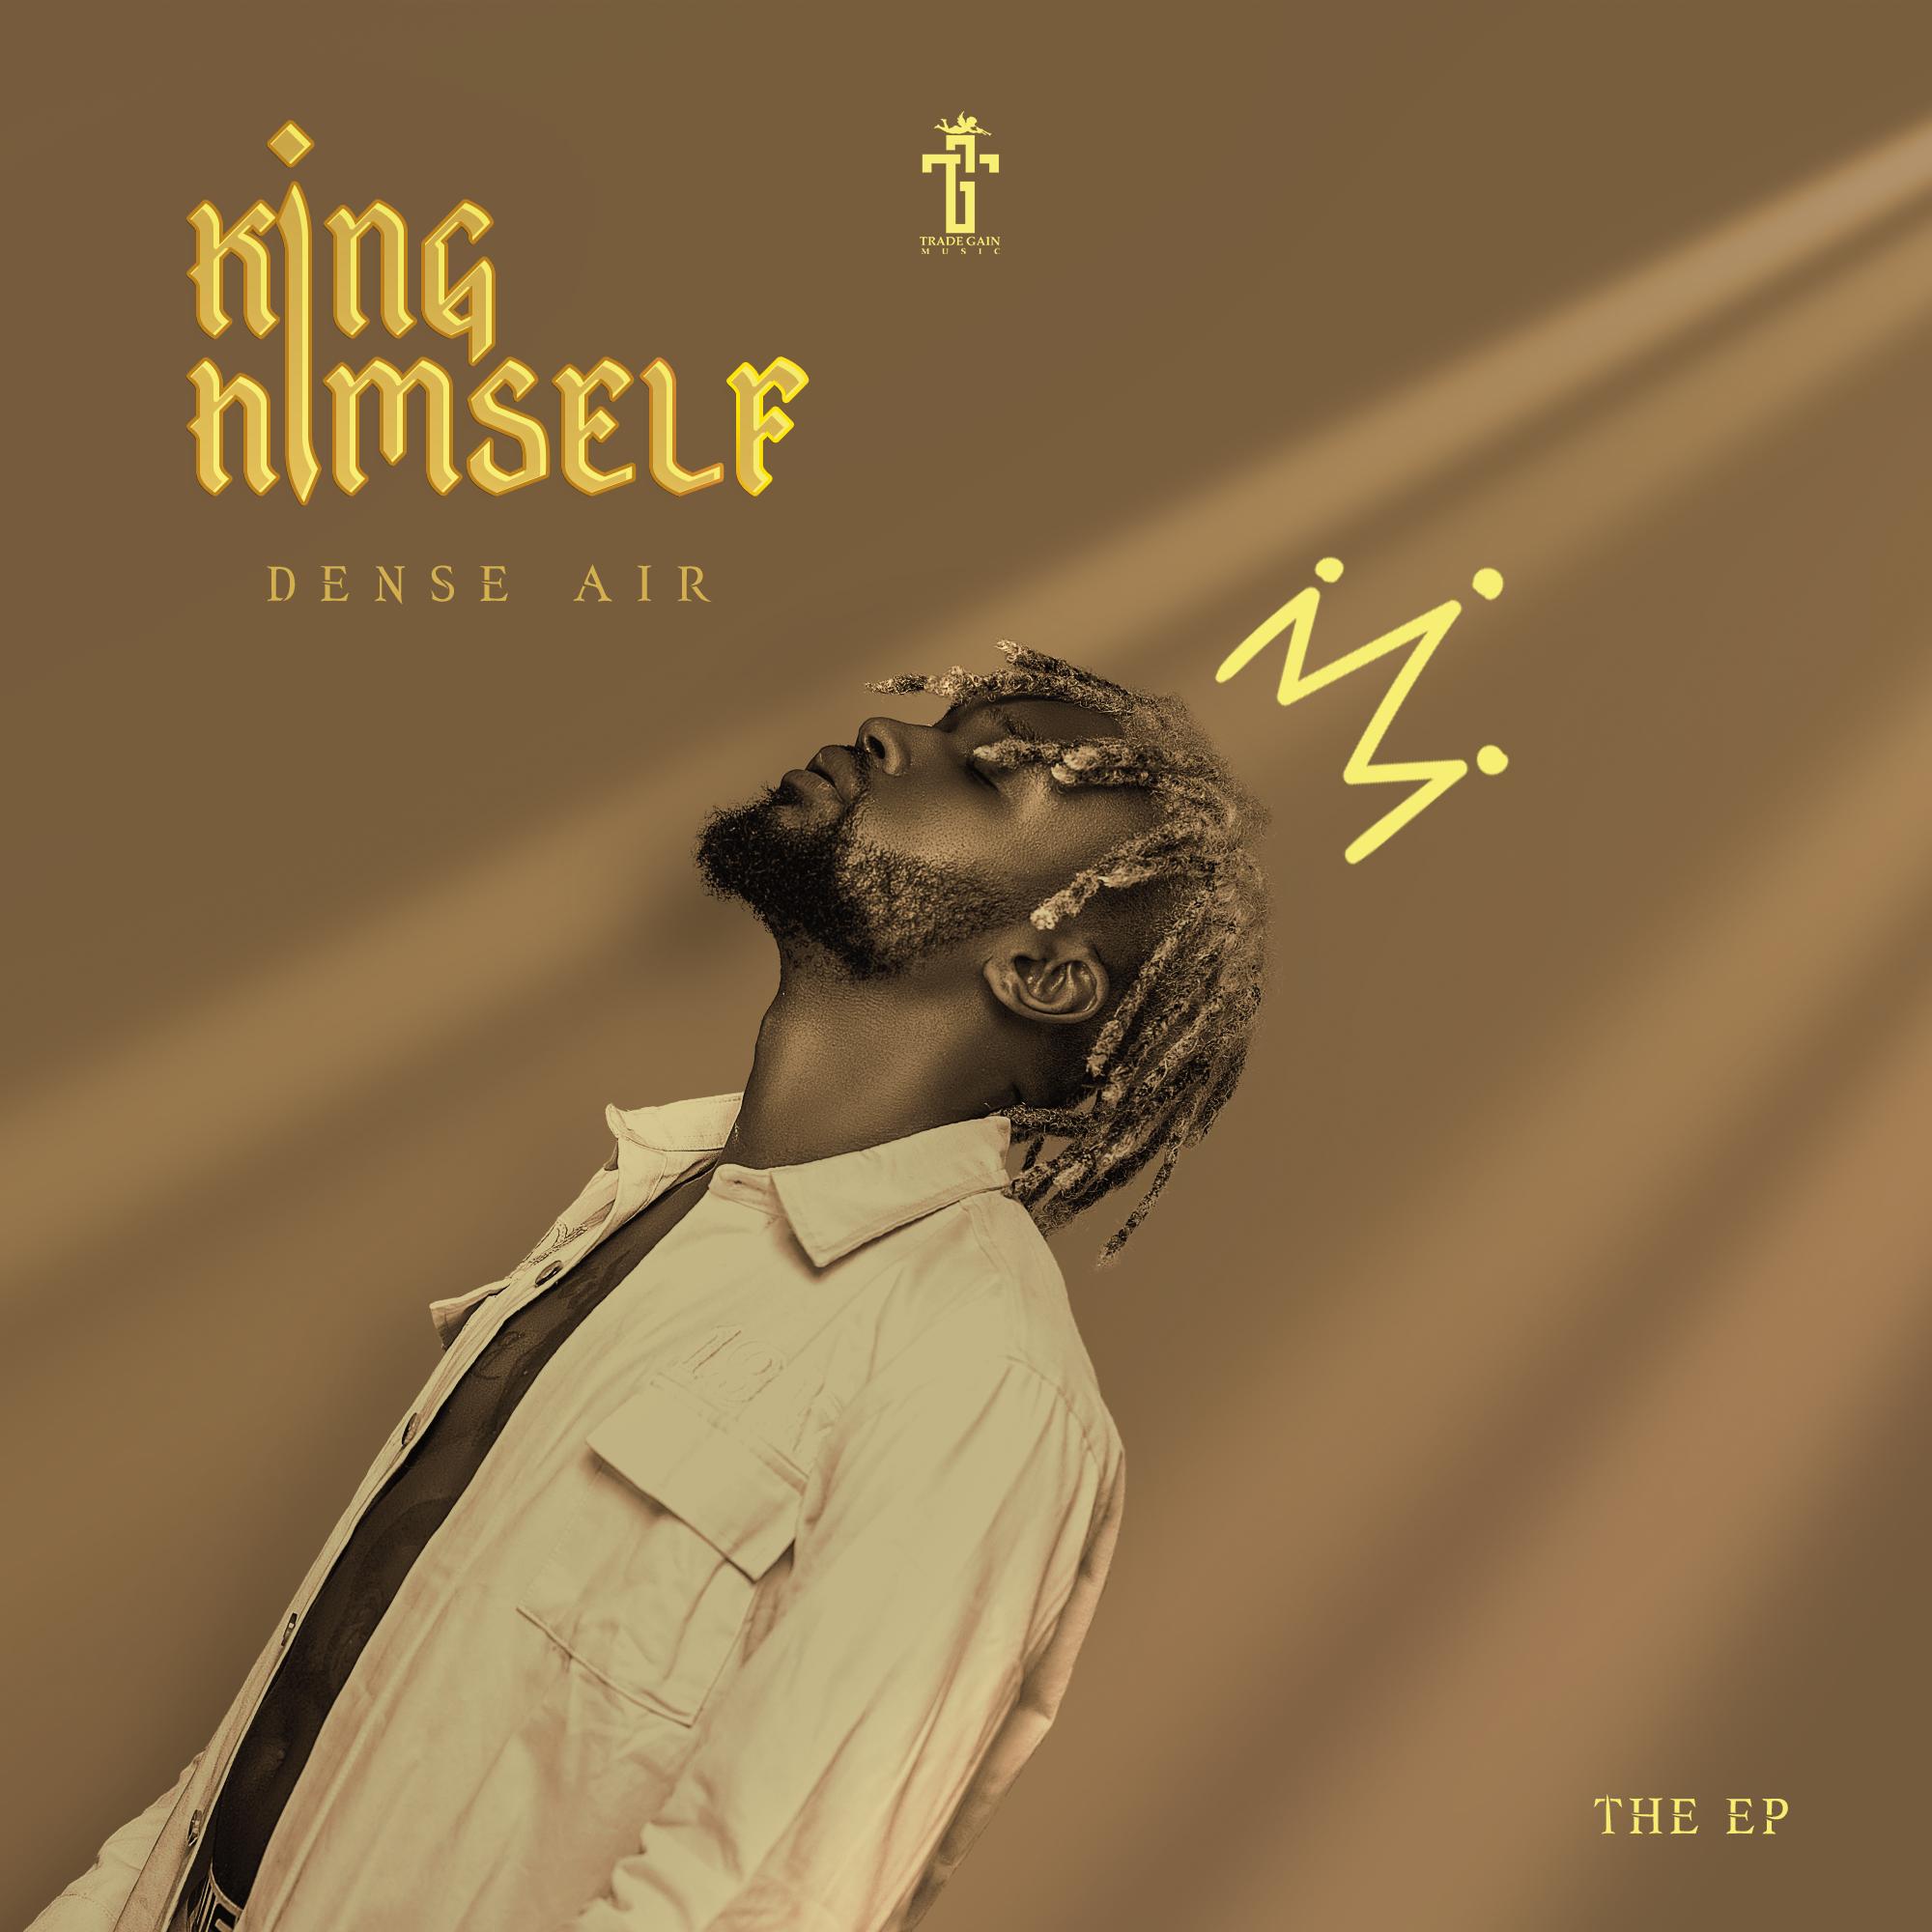 Dense Air - KING HIMSELF EP